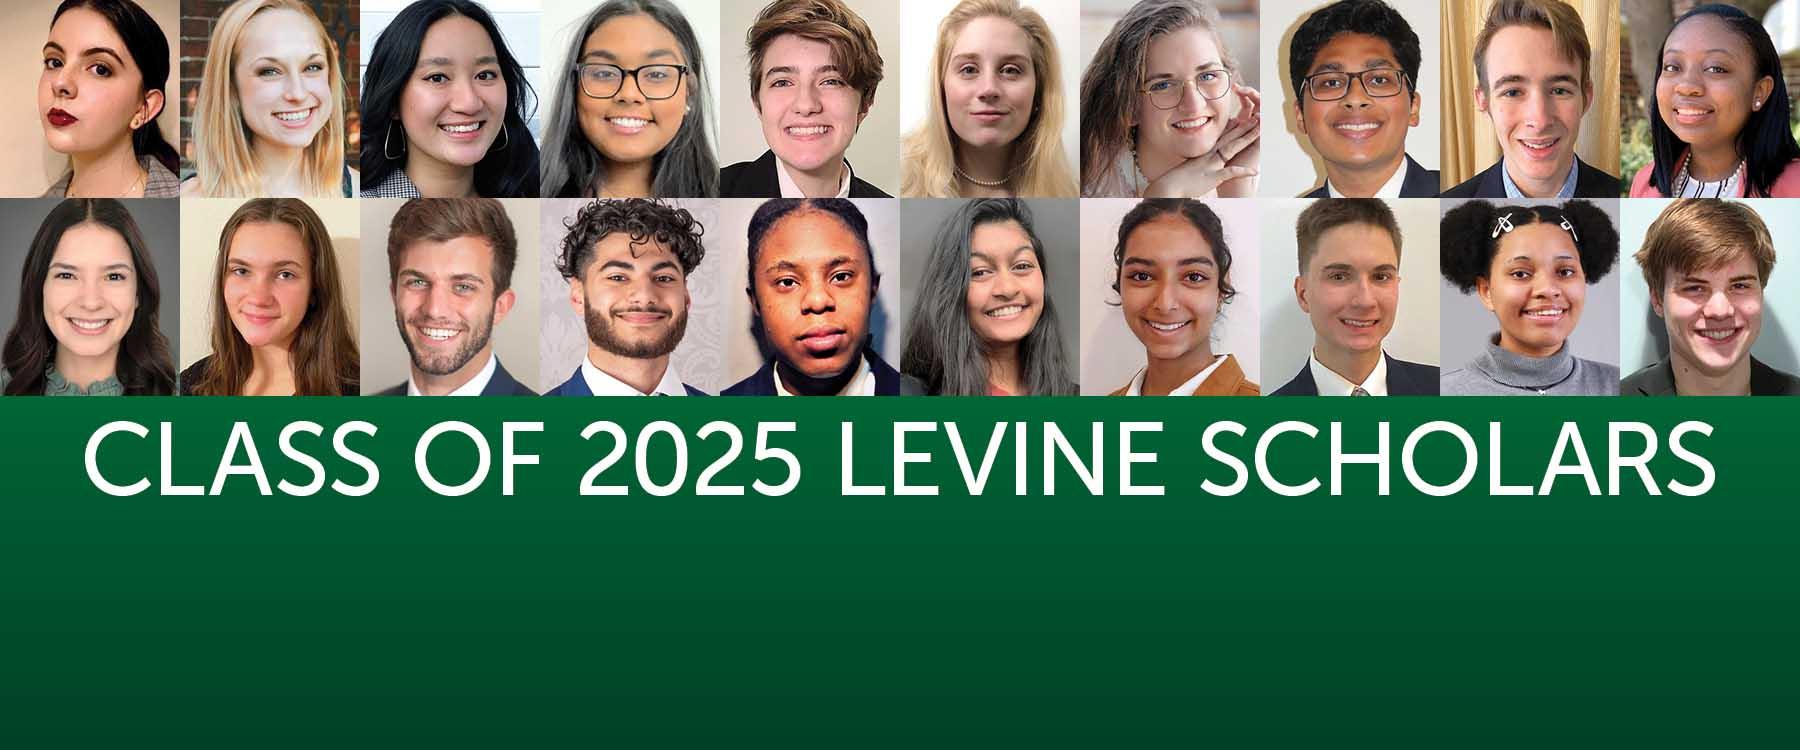 Levine Scholars Class of 2025